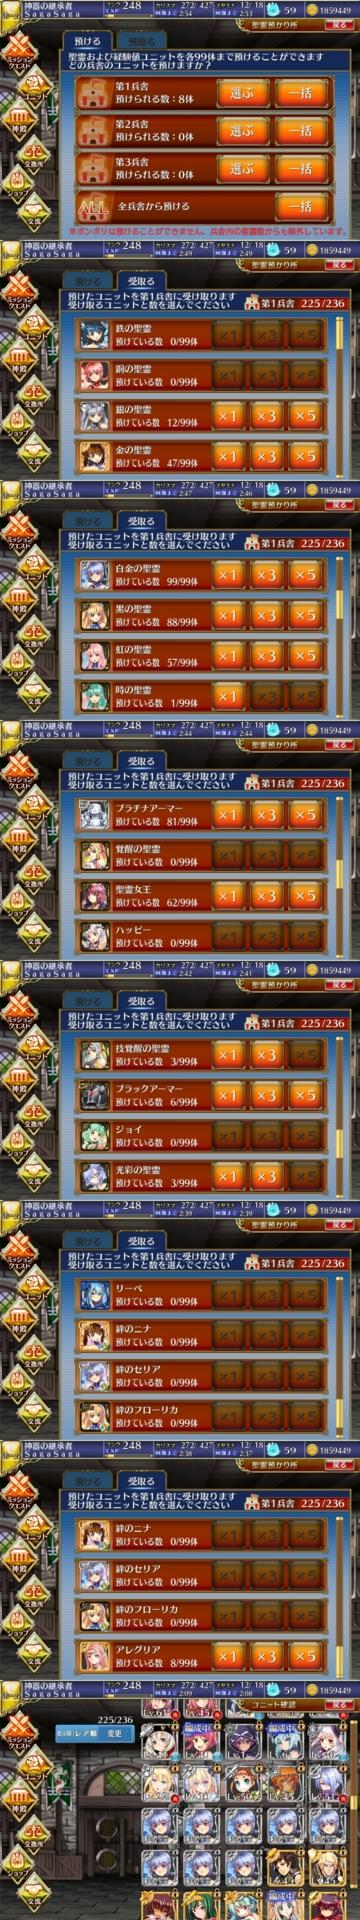 f:id:himajin-mode:20160807085057j:plain